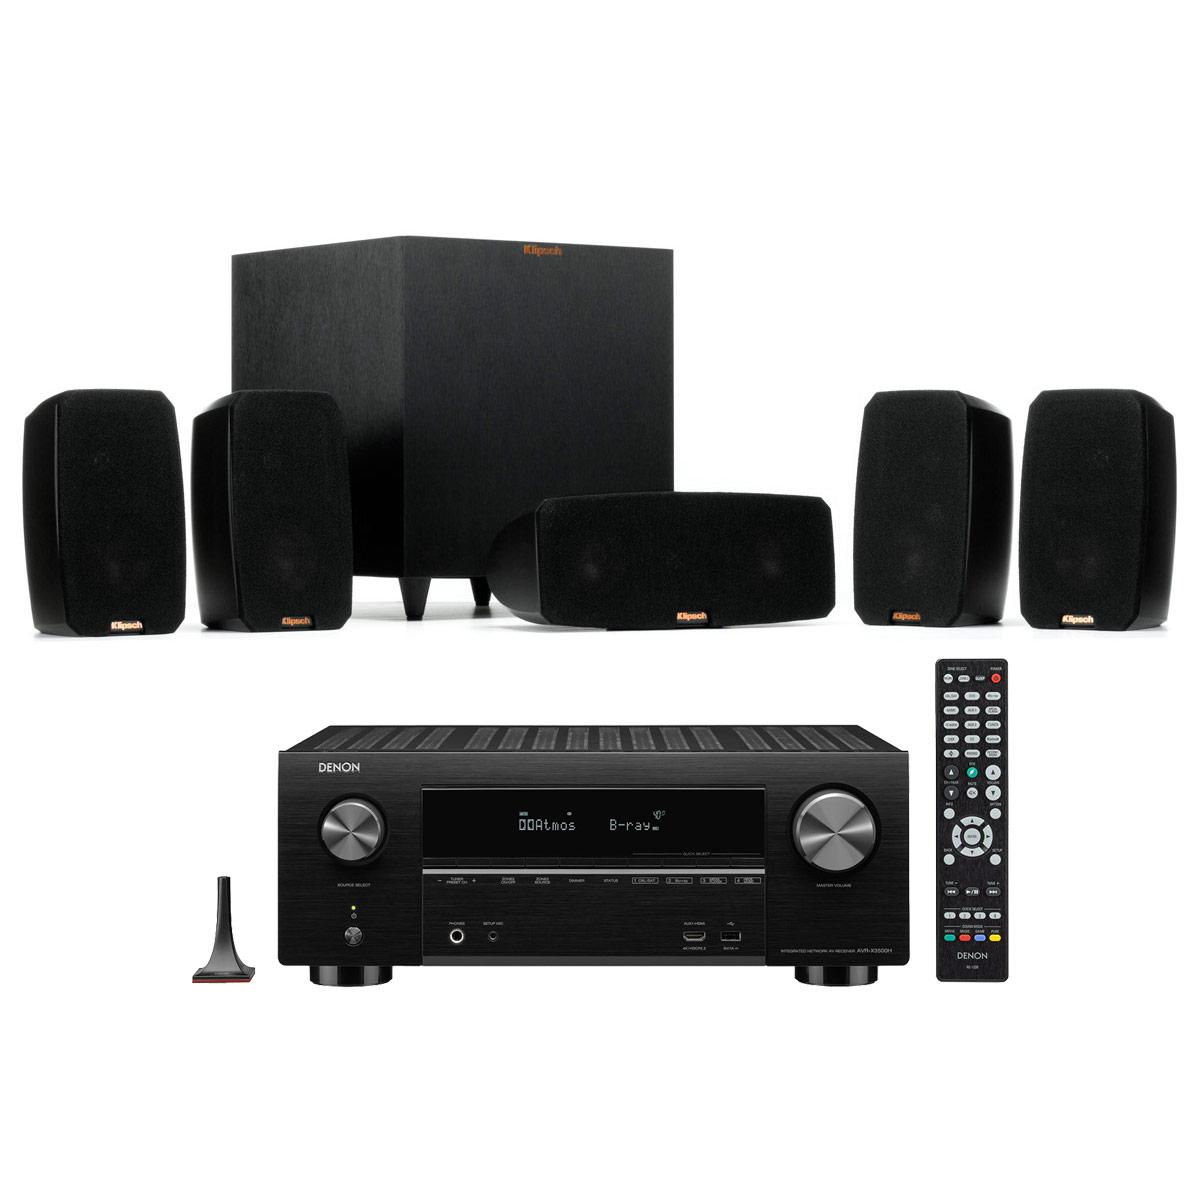 Ensemble home cinéma Denon AVR-X3500H Noir + Klipsch Reference Theater Pack Ampli-tuner Home Cinema 3D Ready 7.2 - Dolby Atmos / DTS:X - 8x HDMI 4K Ultra HD, HDCP 2.2, HDR - Wi-Fi, Bluetooth, AirPlay 2 - Multiroom - Amazon Alexa + Pack d'enceintes 5.1 avec caisson de basses sans fil